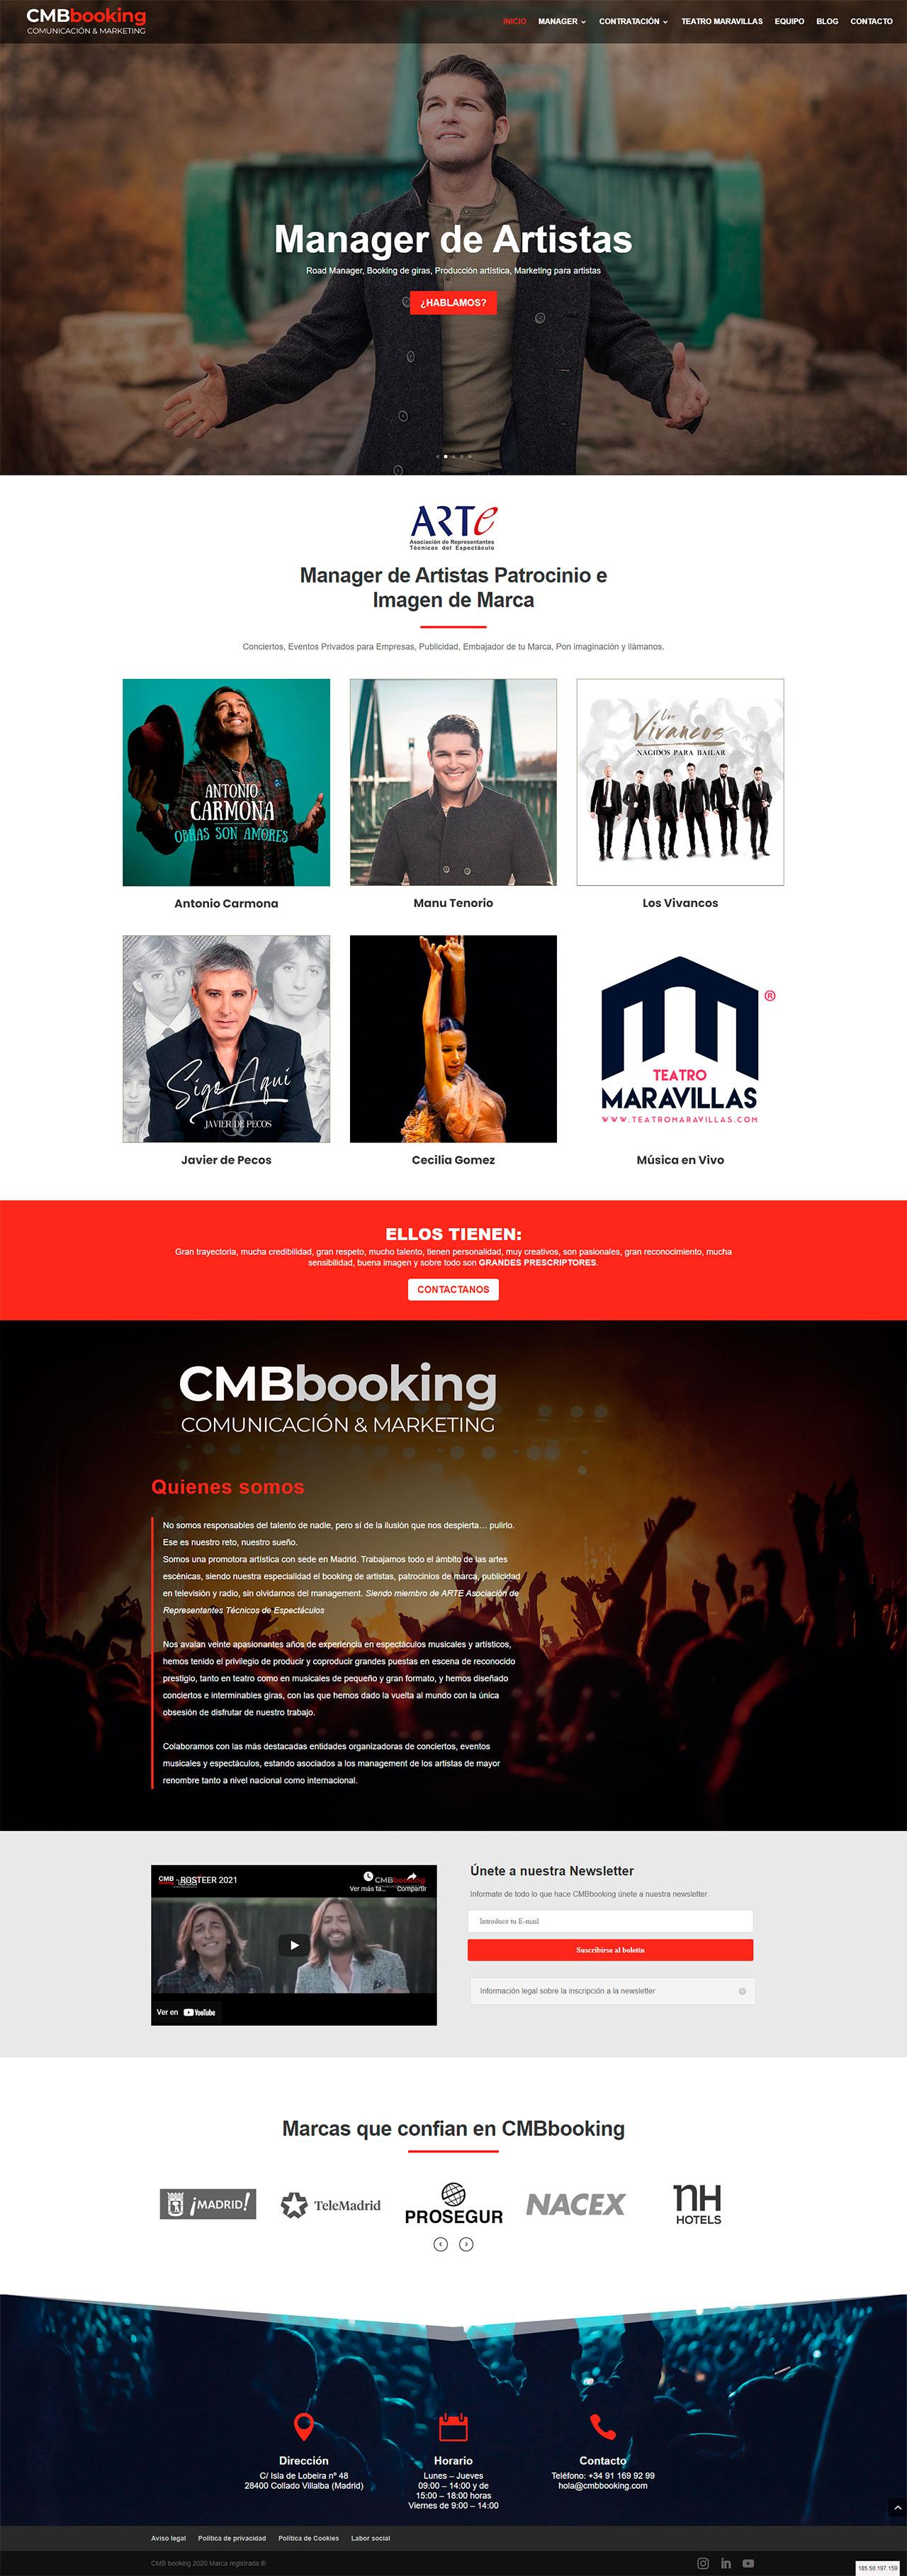 CMBbooking-portofio-diseño-web-madrid